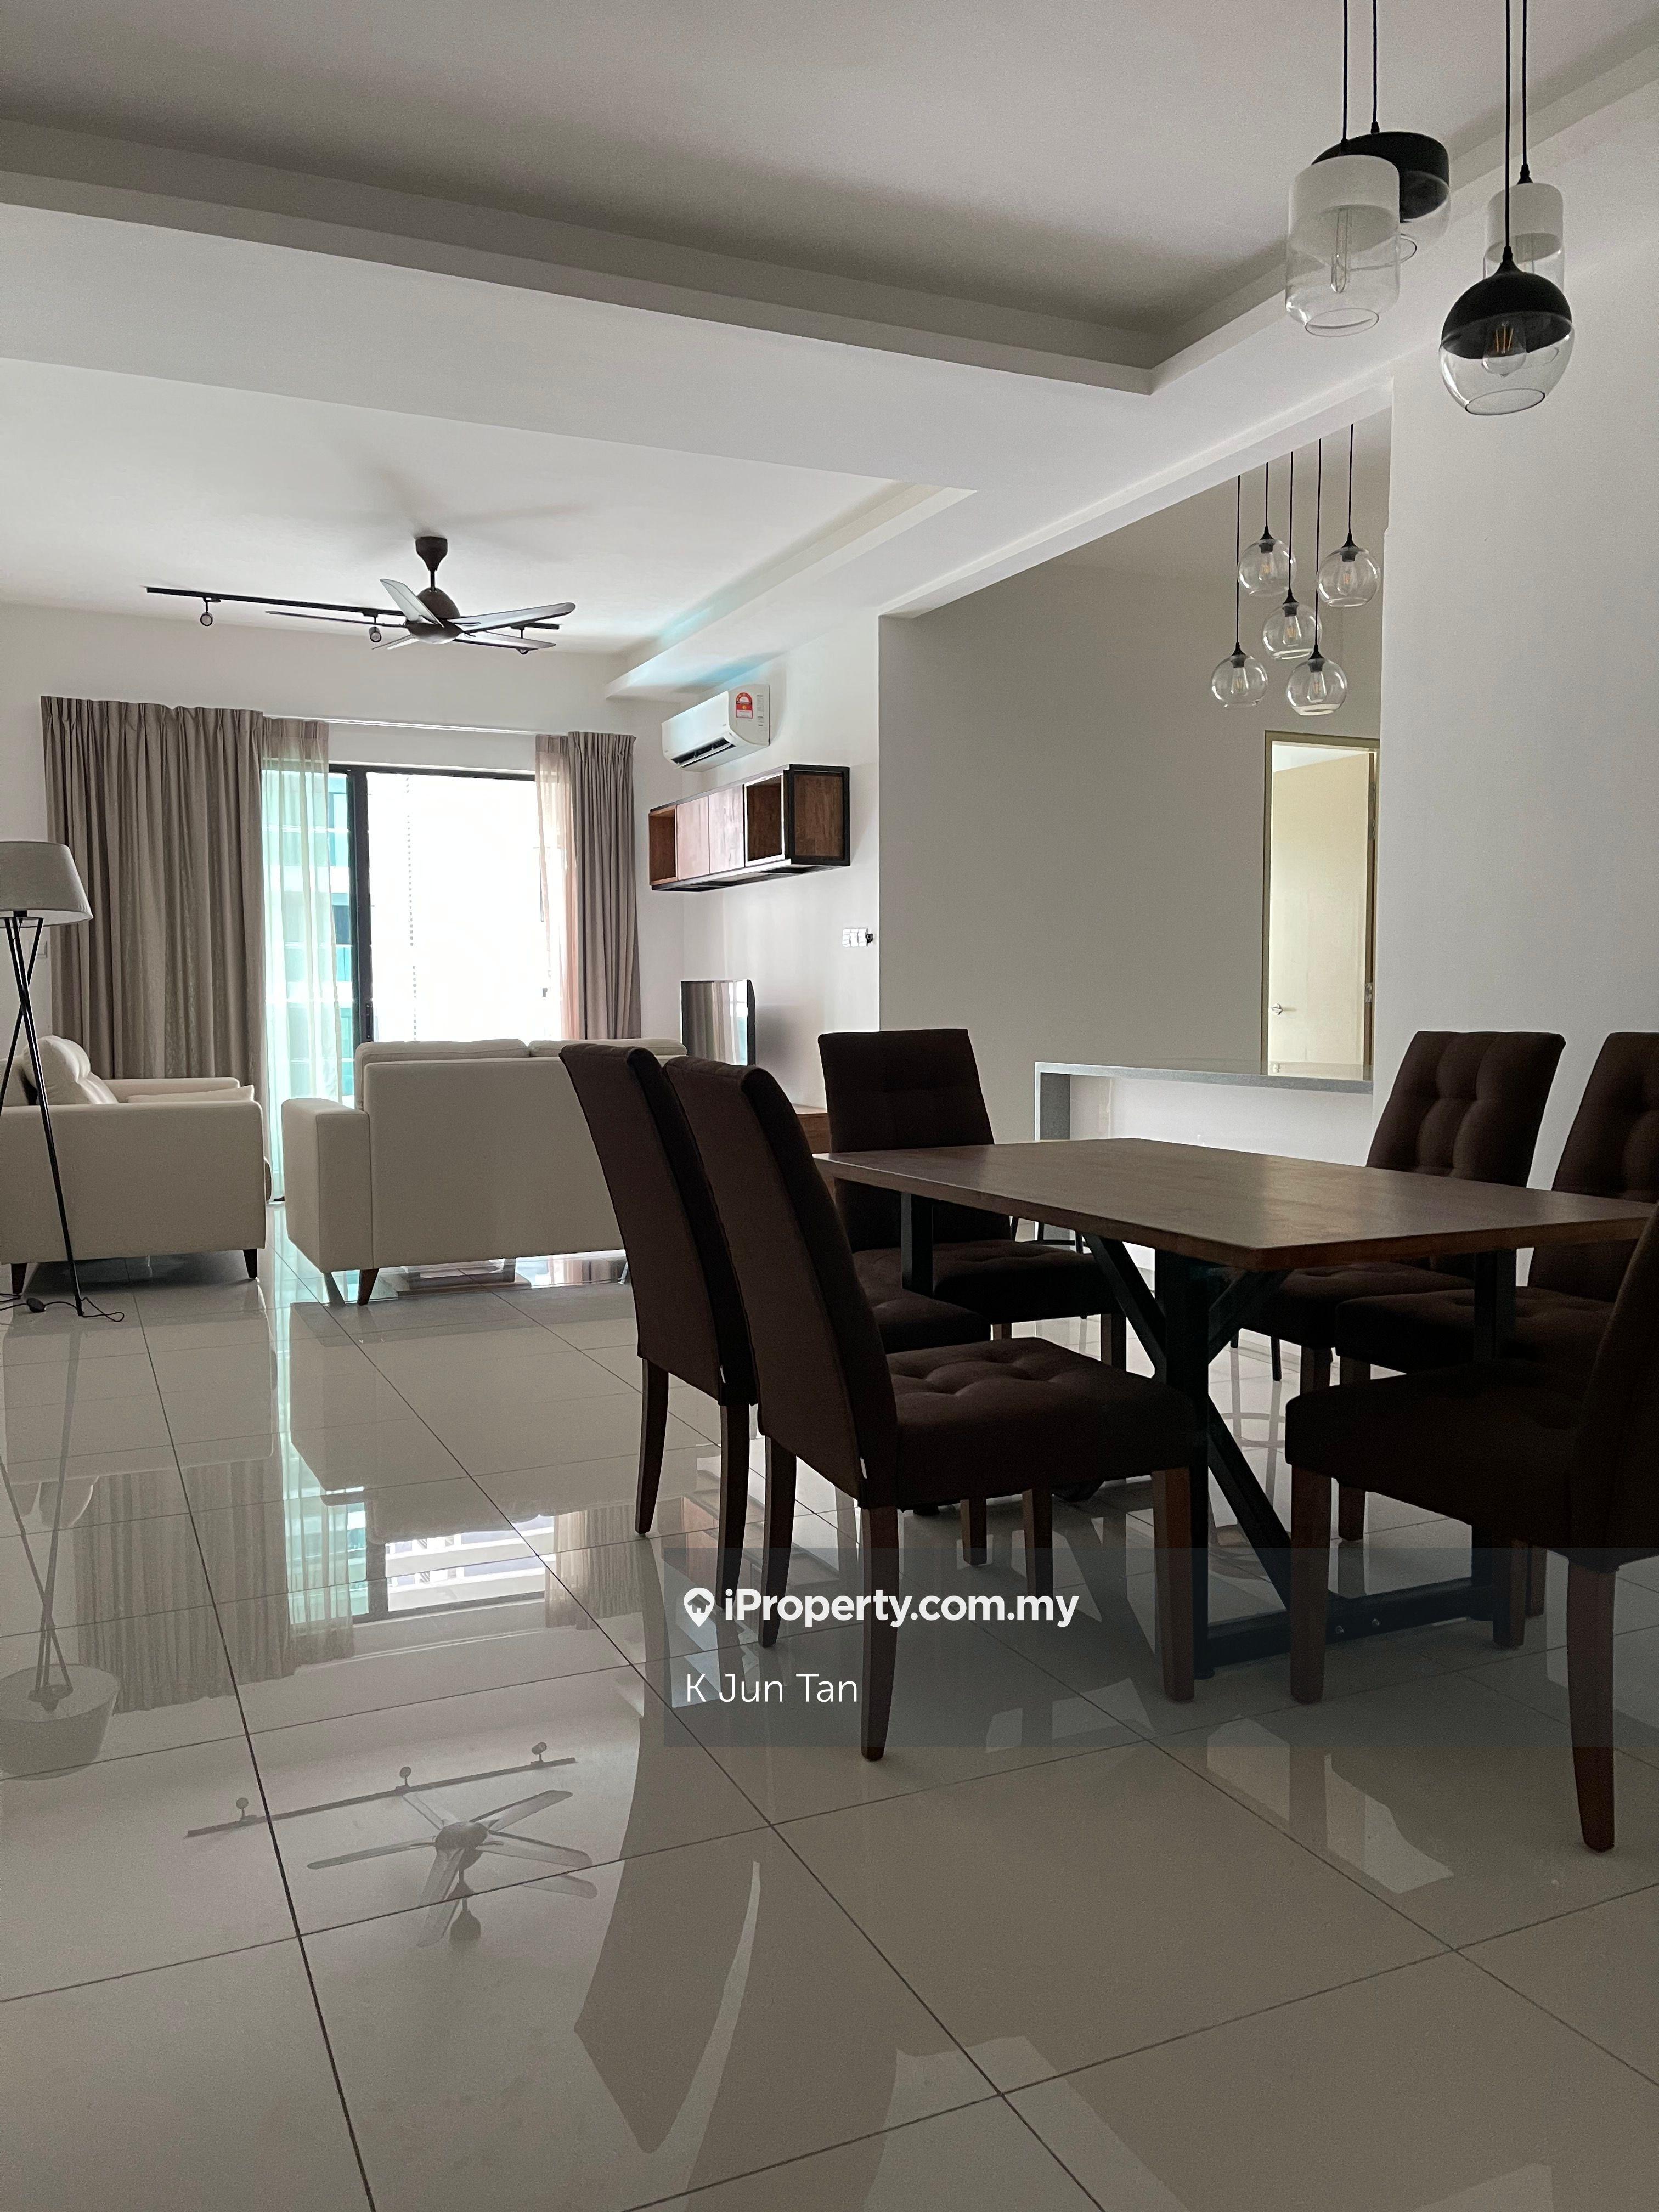 Residensi Harmoni 2, Taman Bukit Prima Pelangi, Segambut